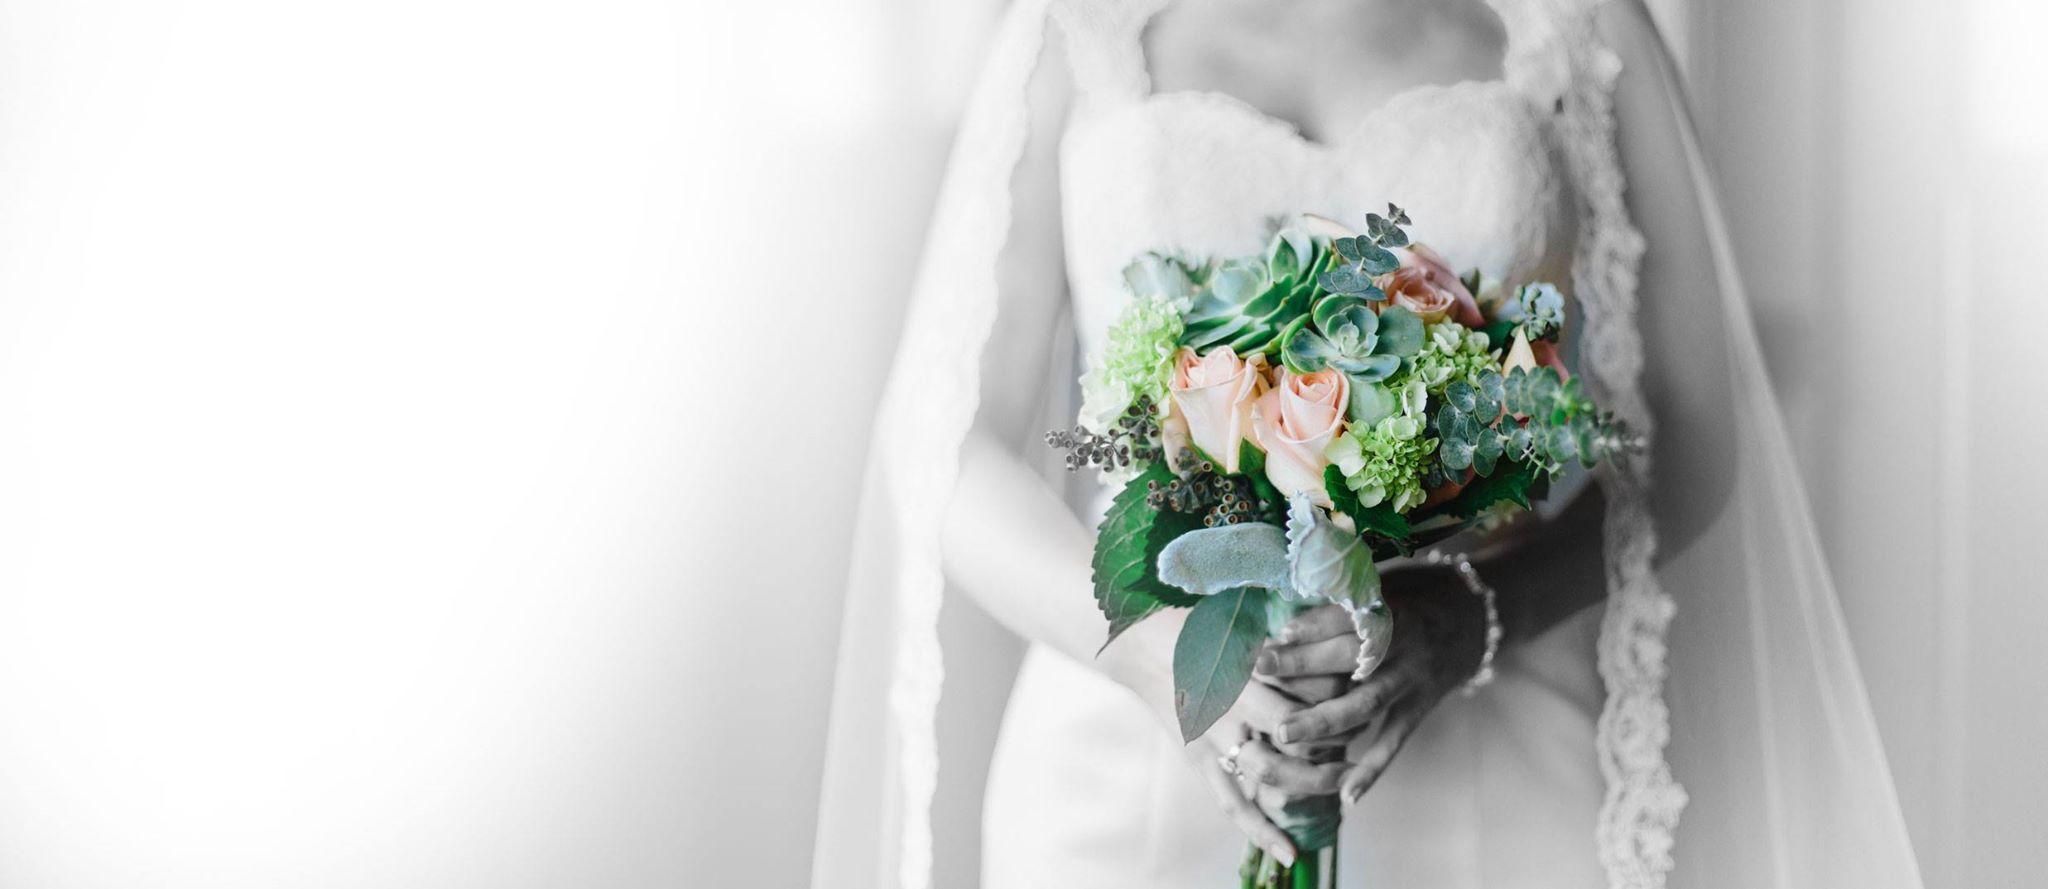 Zin's Flowers - Zin's Flowers